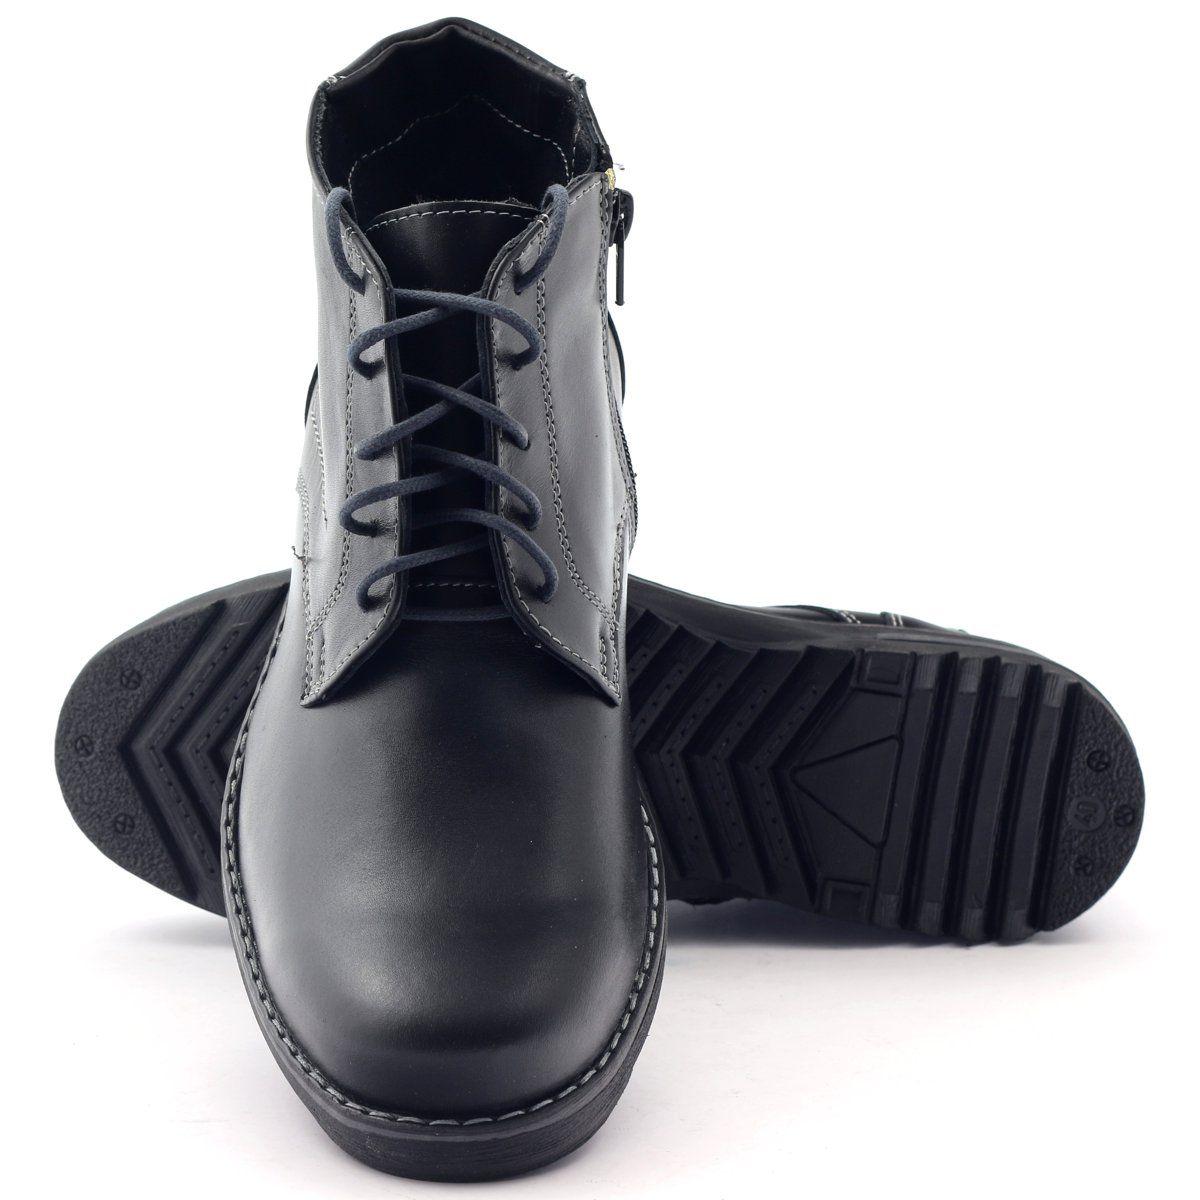 Trzewiki Meskie Skorzane Czarne Naszbut 954 Combat Boots Boots Dr Martens Boots